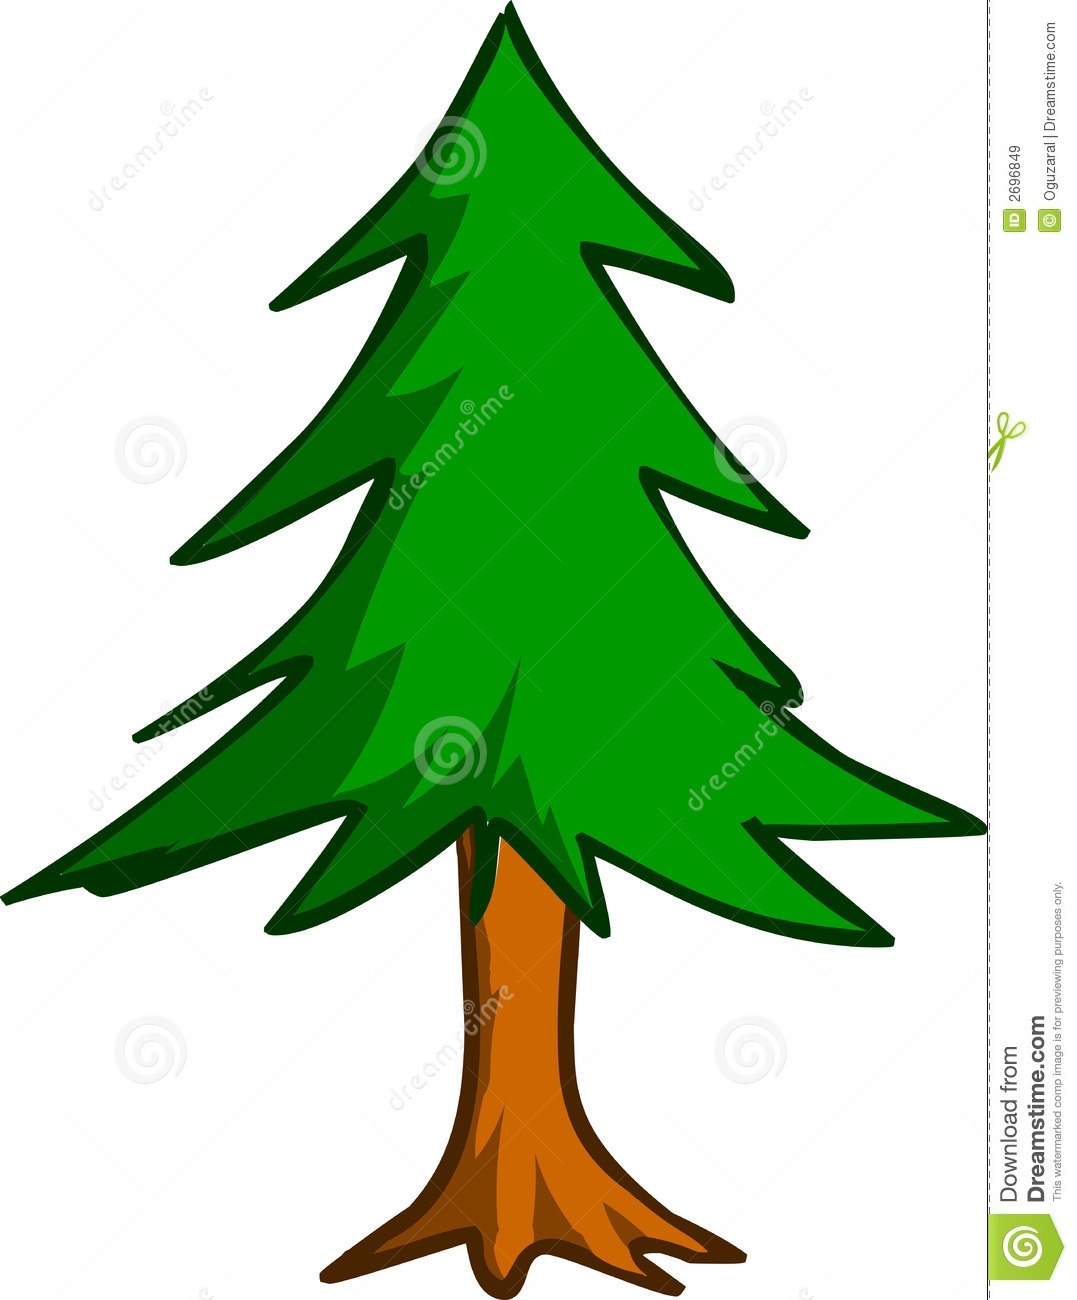 1077x1300 Unique Pine Tree Clipart Collection